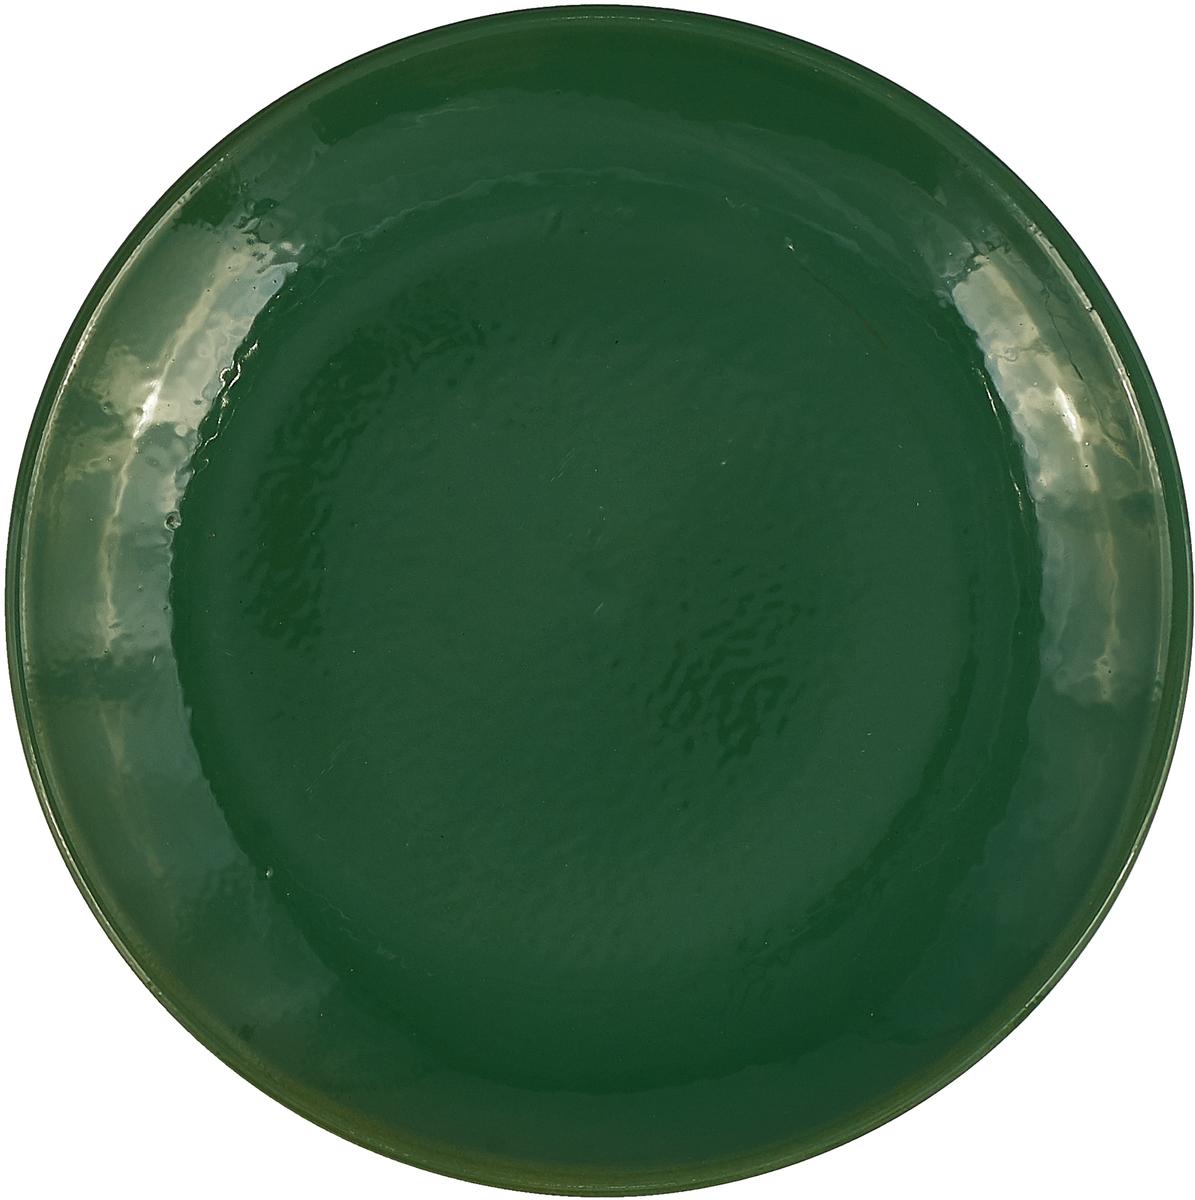 Тарелка Борисовская керамика Радуга, цвет: зеленый, диаметр 23 см invicta часы invicta in22432 коллекция pro diver